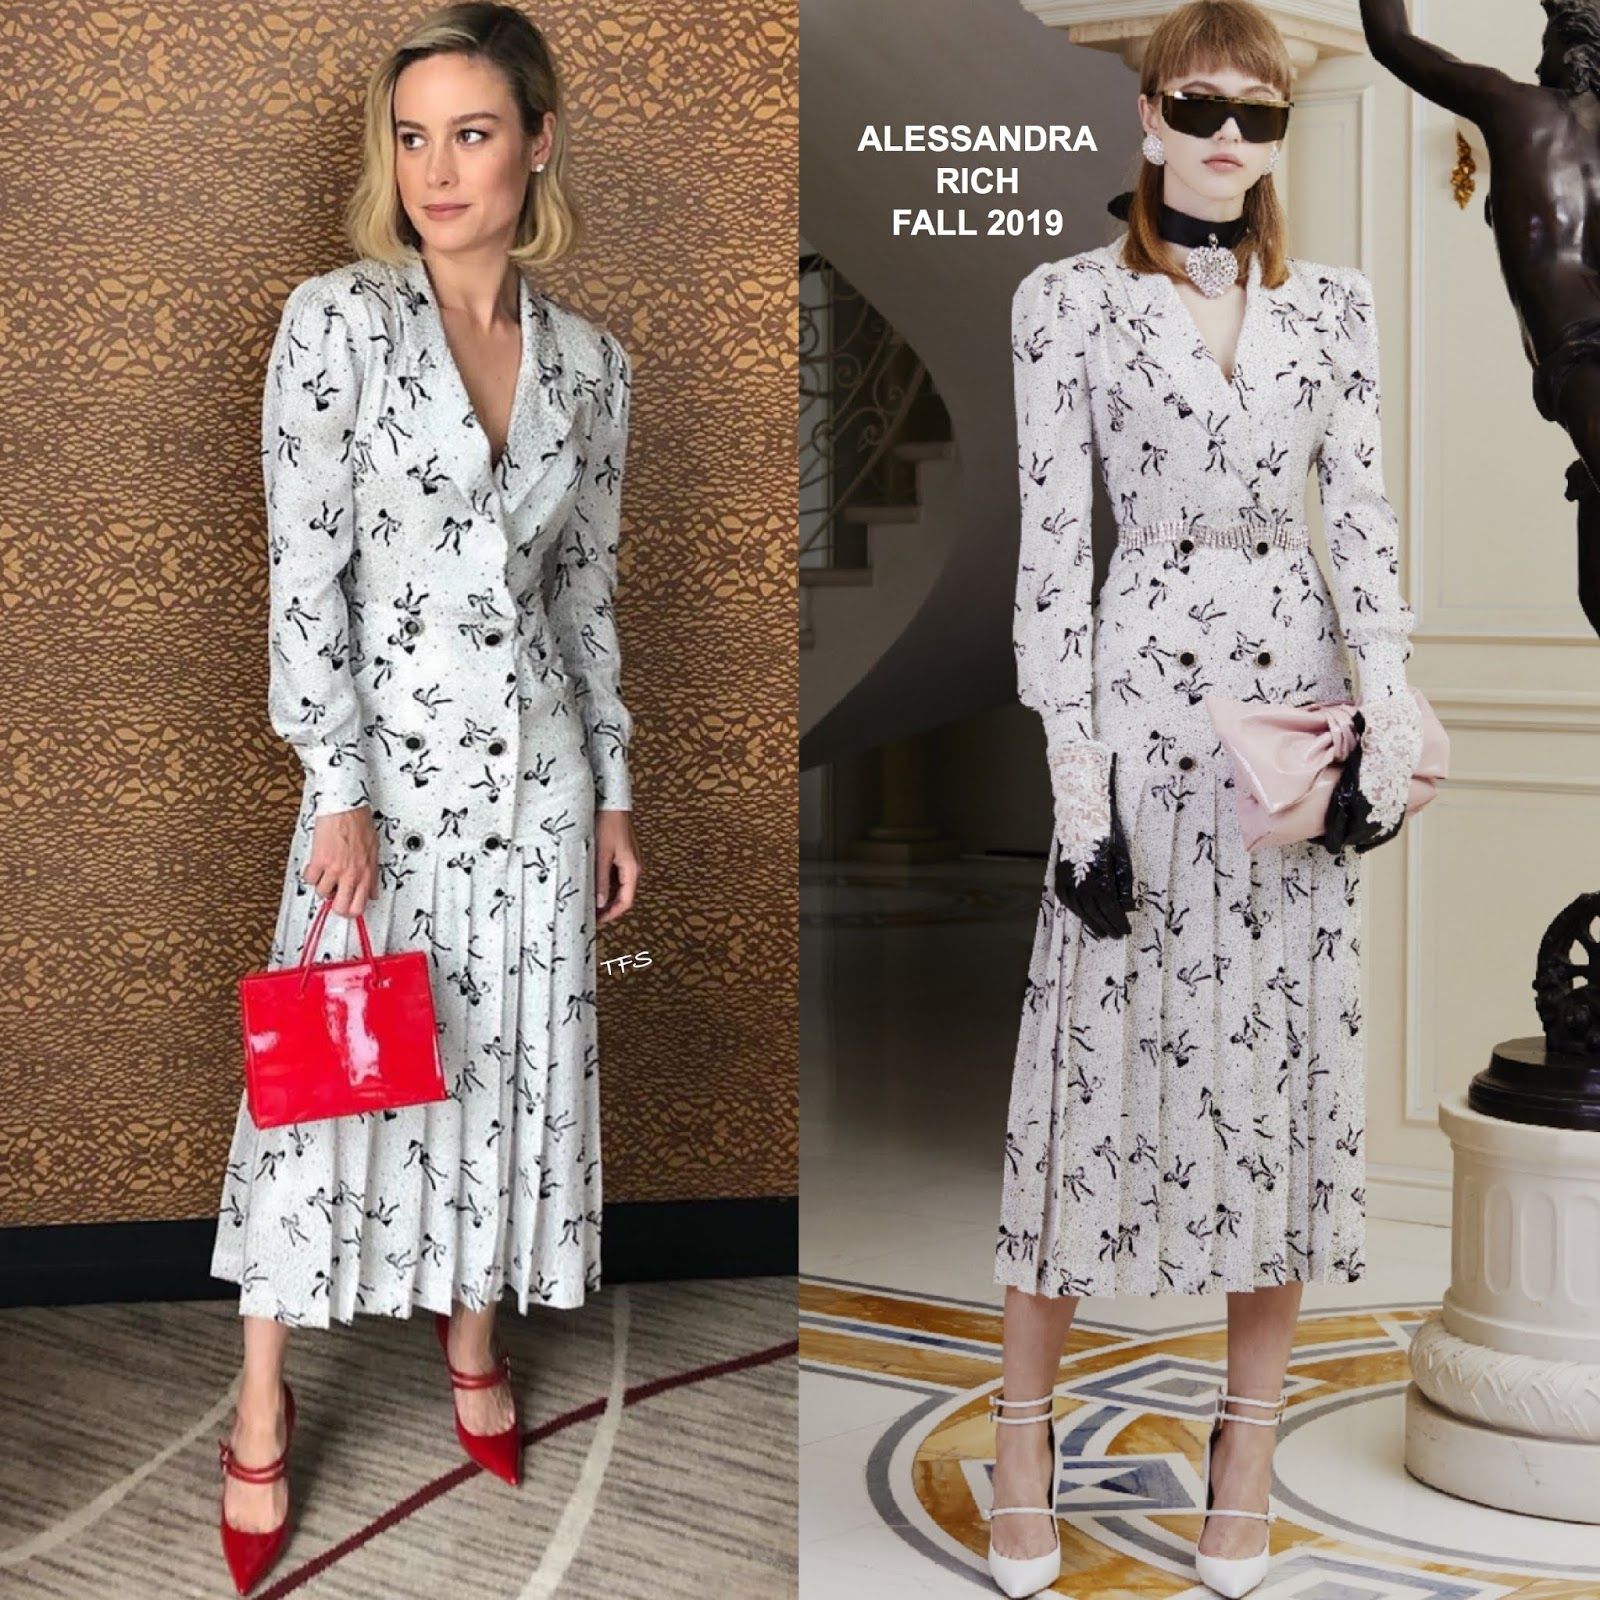 sale uk reasonably priced best sneakers Instagram Style: Brie Larson in Alessandra Rich Promoting ...